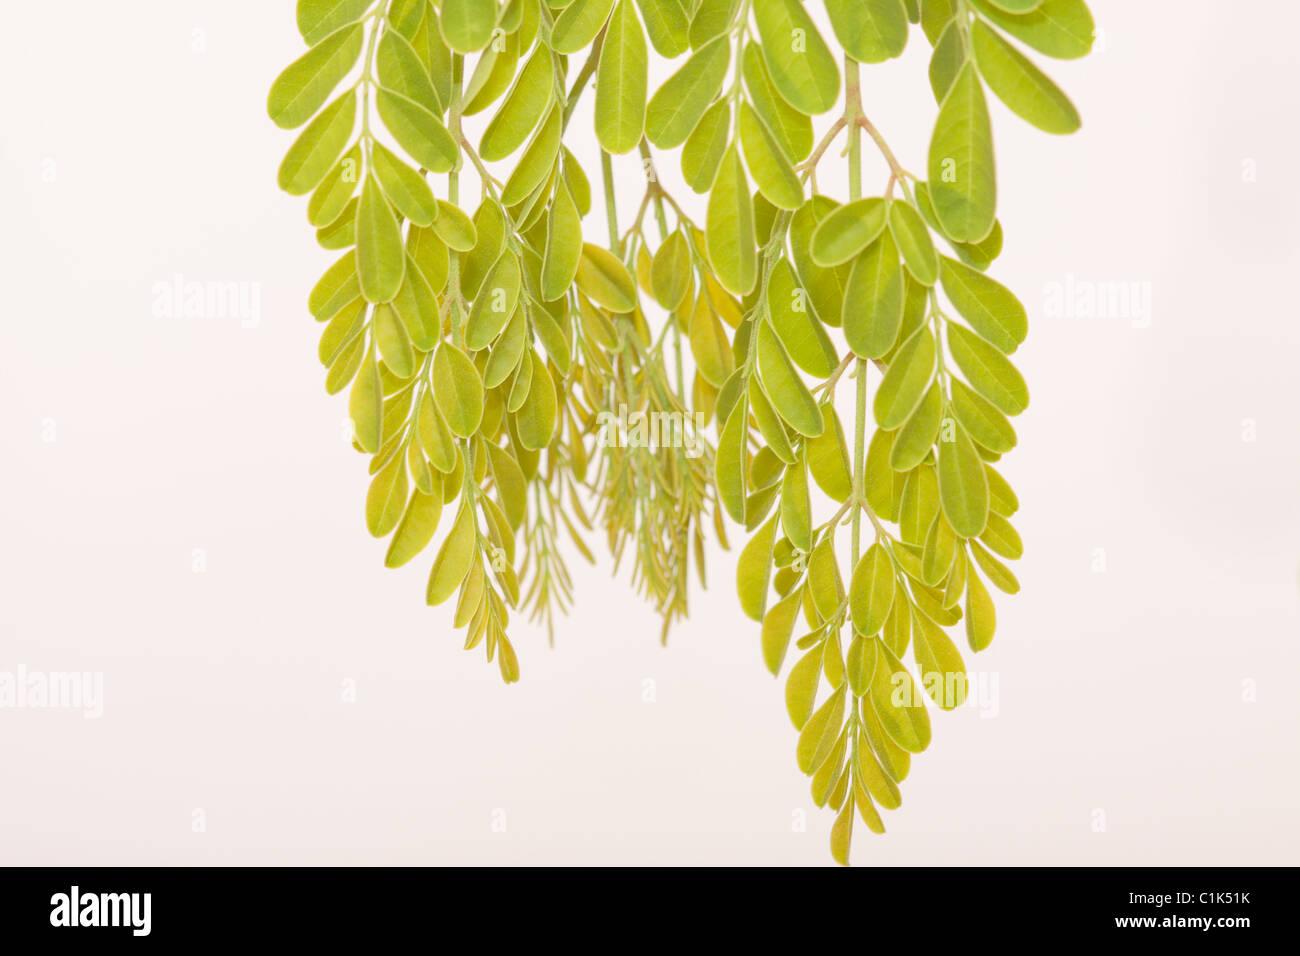 Makroaufnahme Von Moringa Blatter Moringa Oleifera Der Baum Des